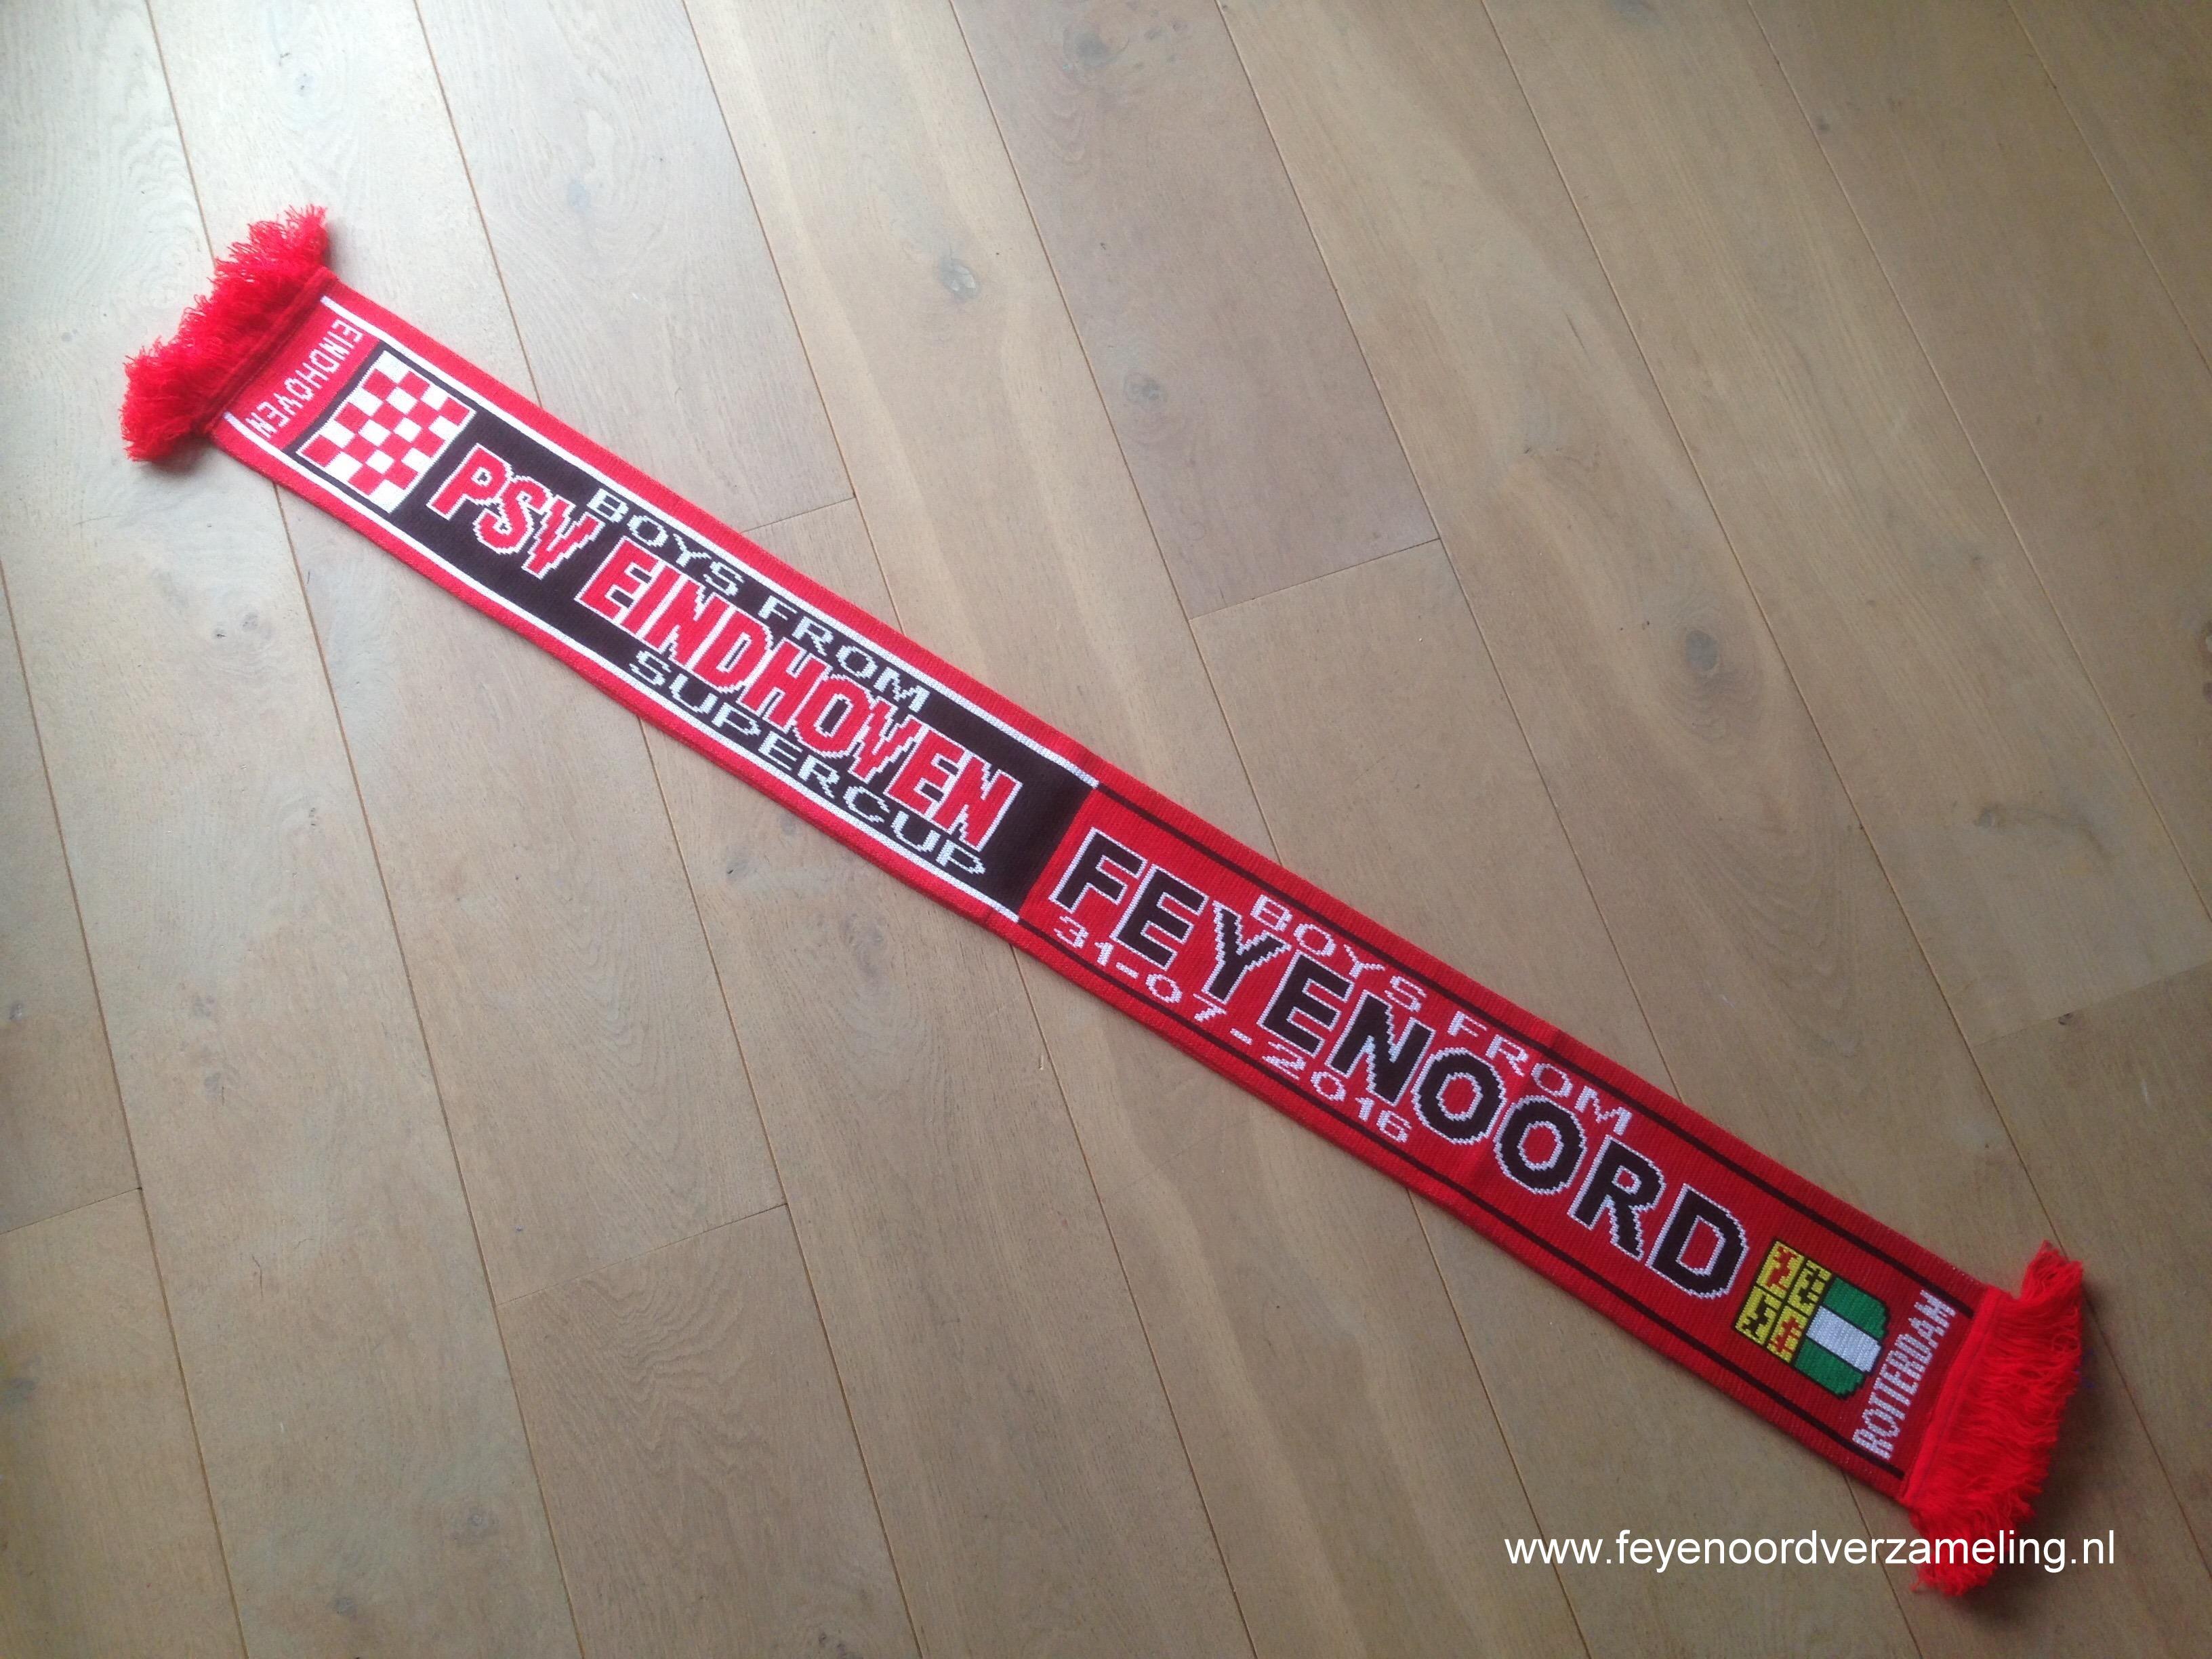 Sjaal Supercup 2016 Feyenoord - PSV